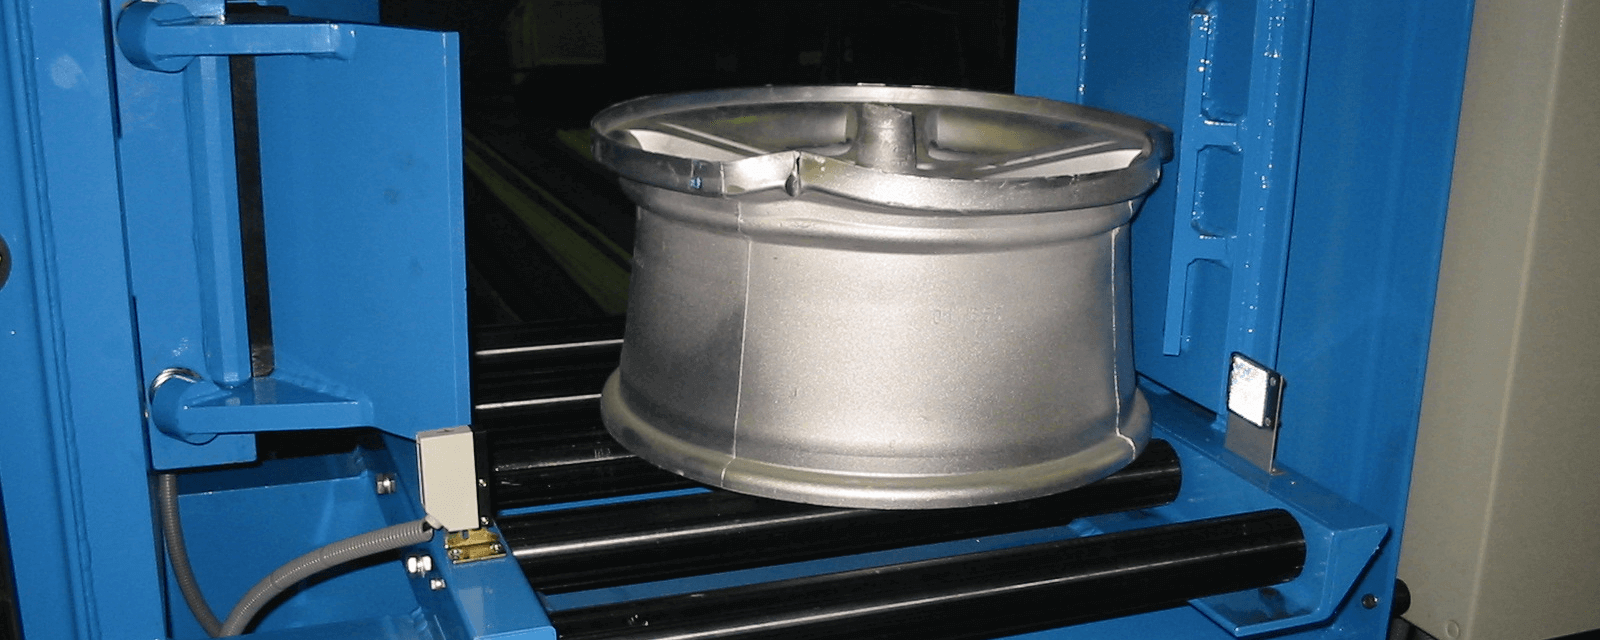 Wheelcrusher header